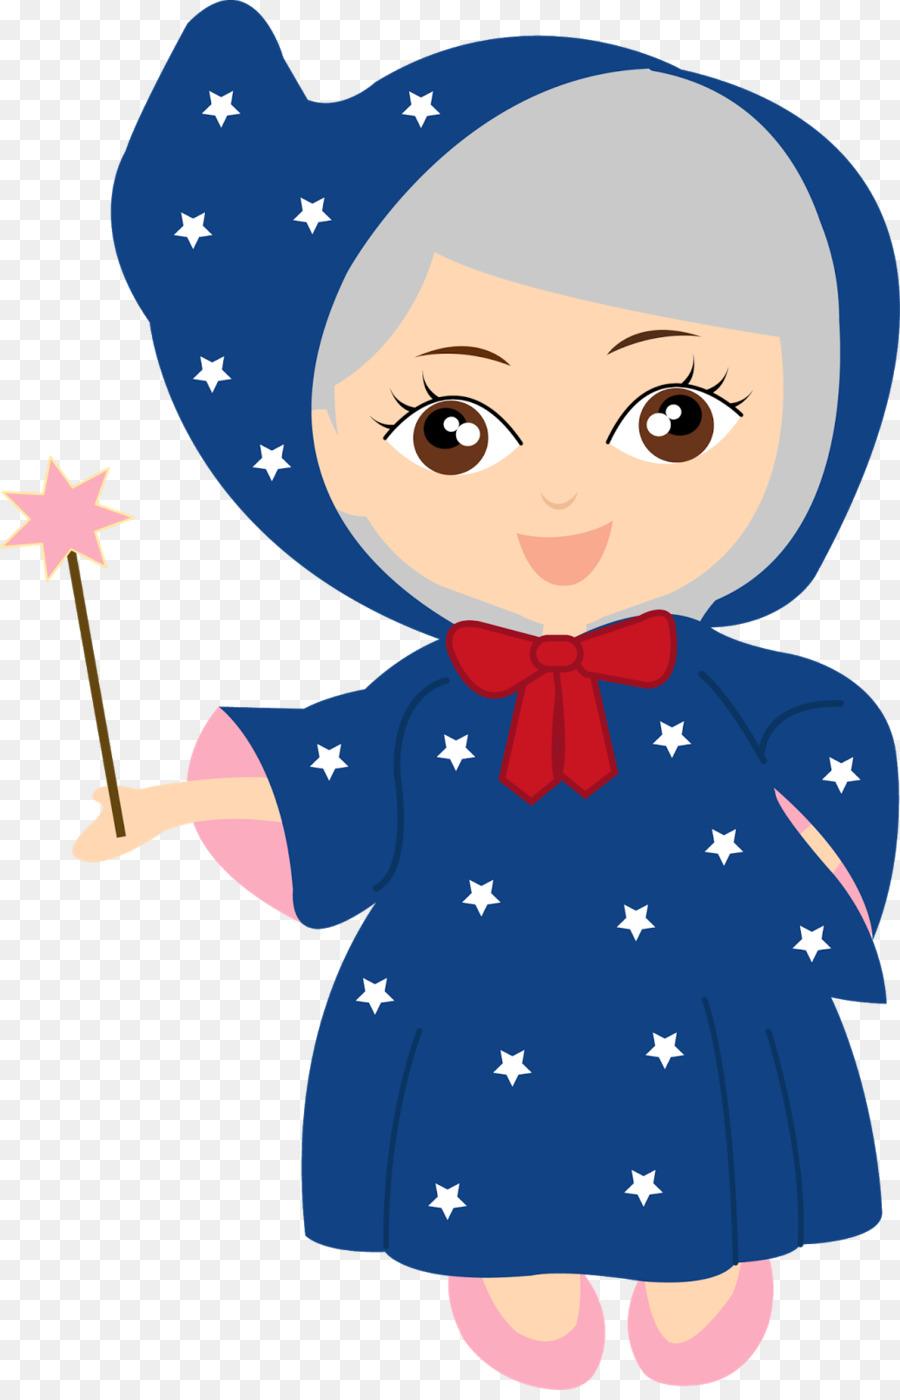 Disney Fairies Fairy godmother Clip art - fan bingbing